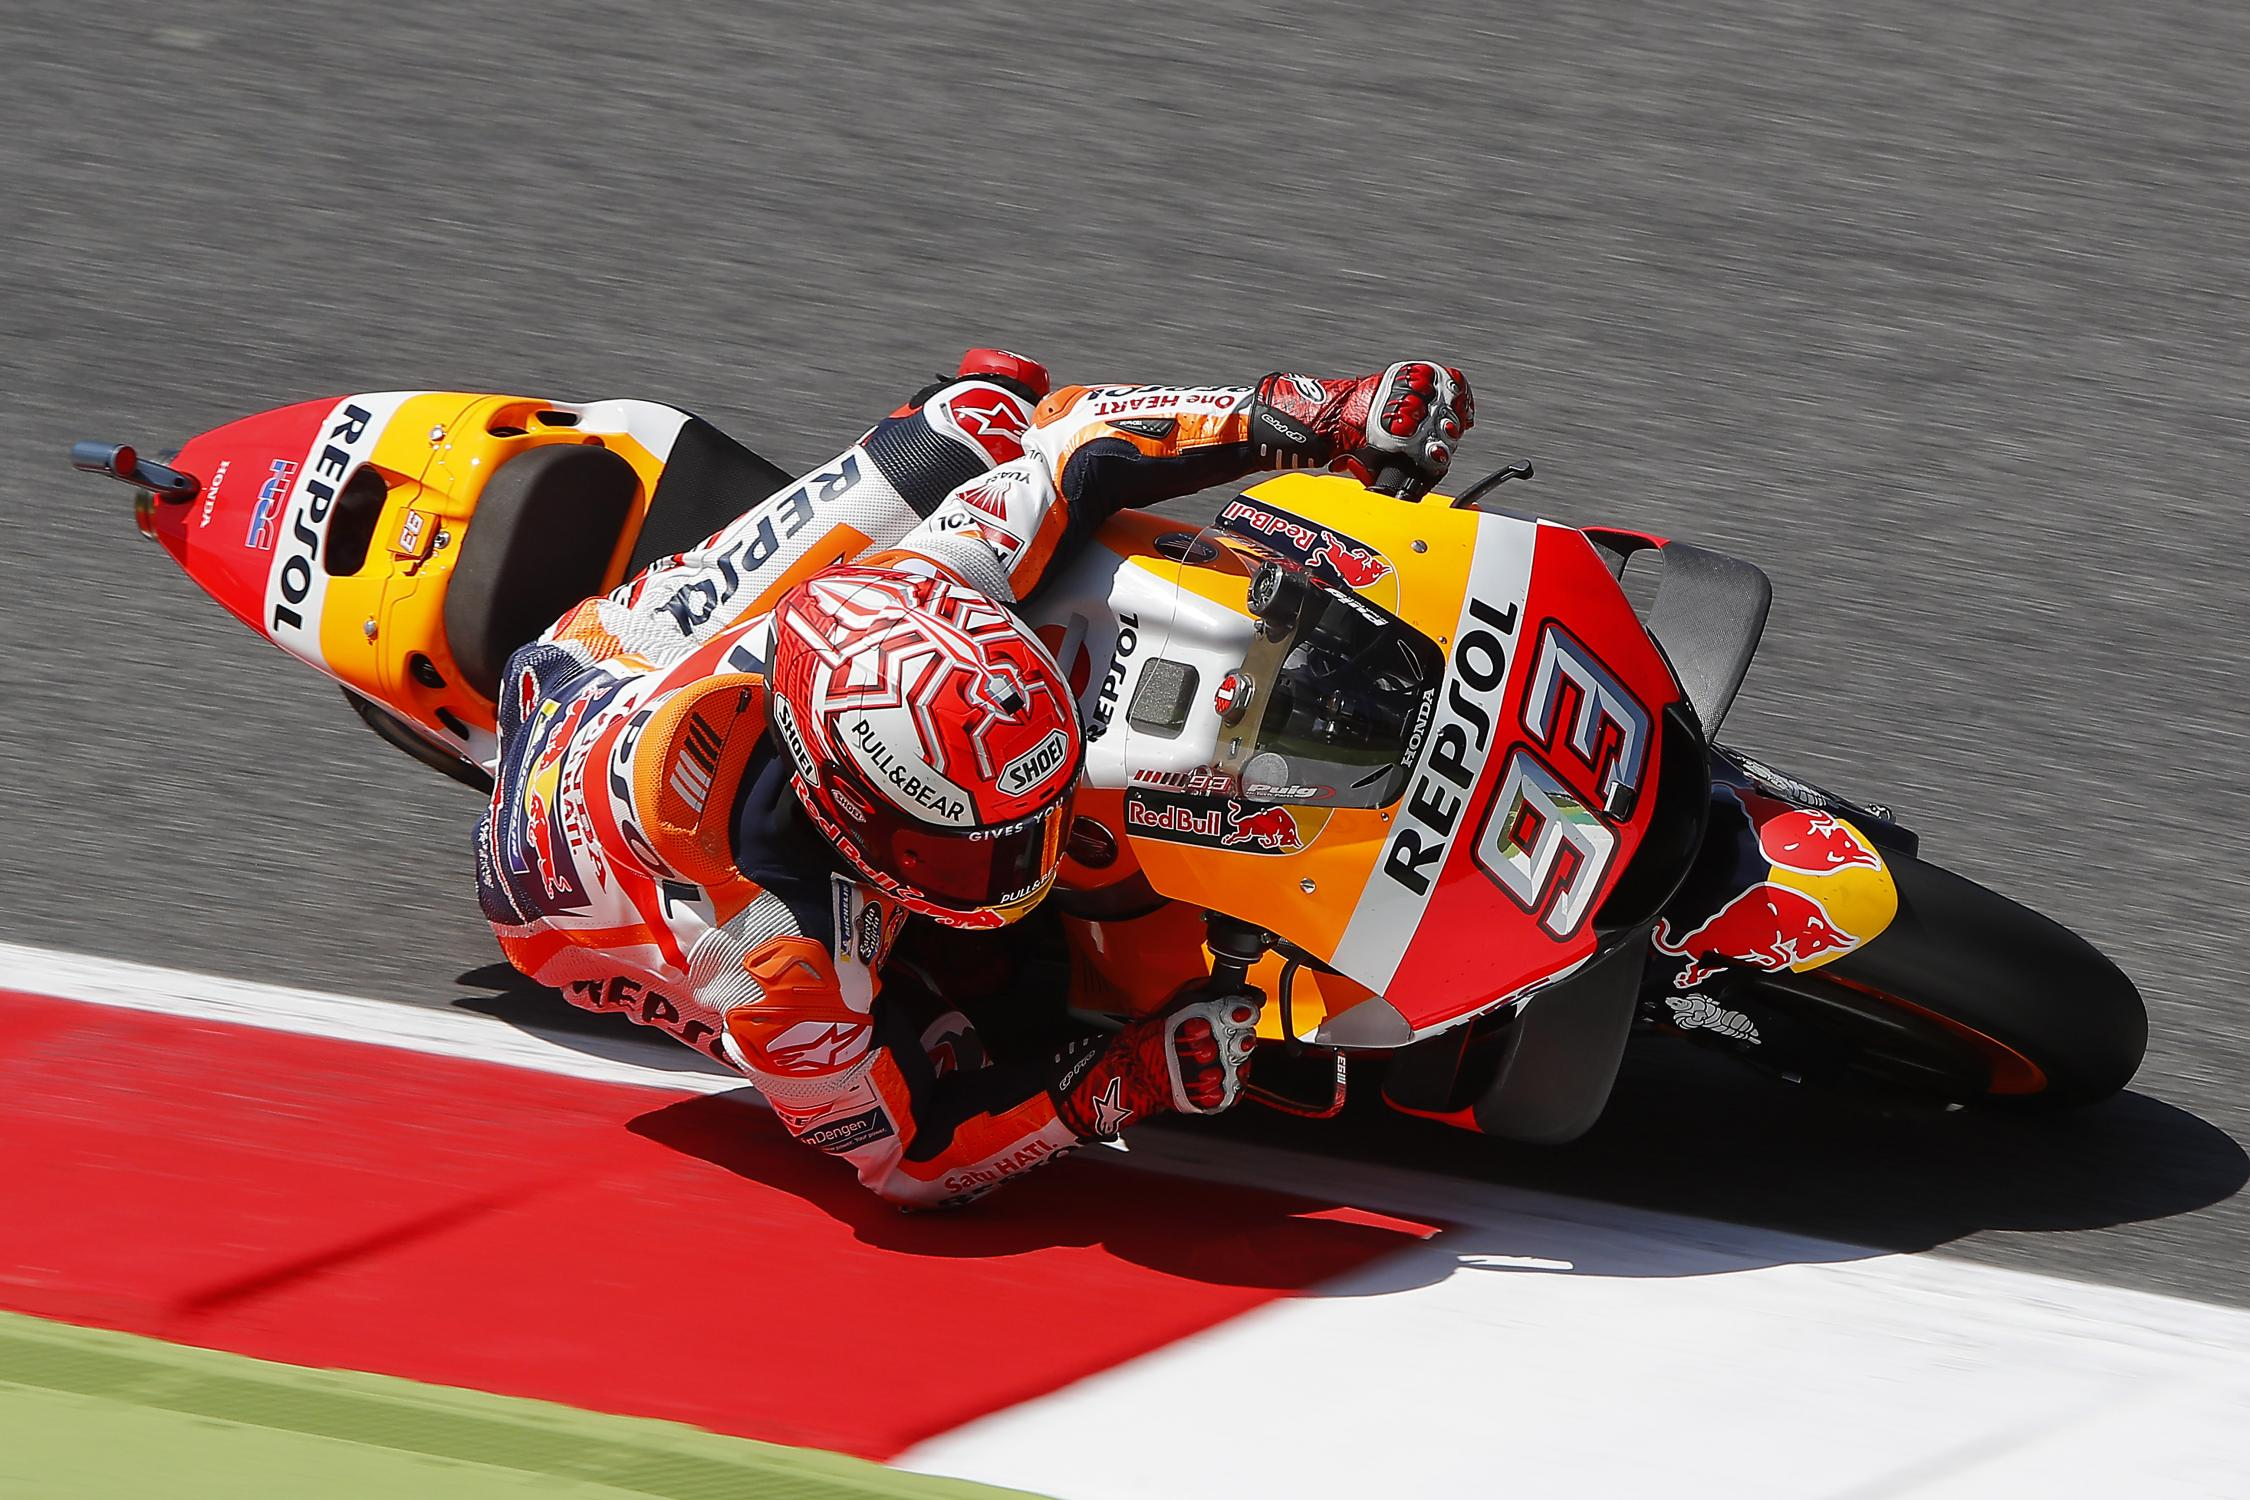 MOTO GP Grand Prix d'Espagne – Jerez  5 mai 2019  Marc-marquez-mugello-corner-motogp-2018